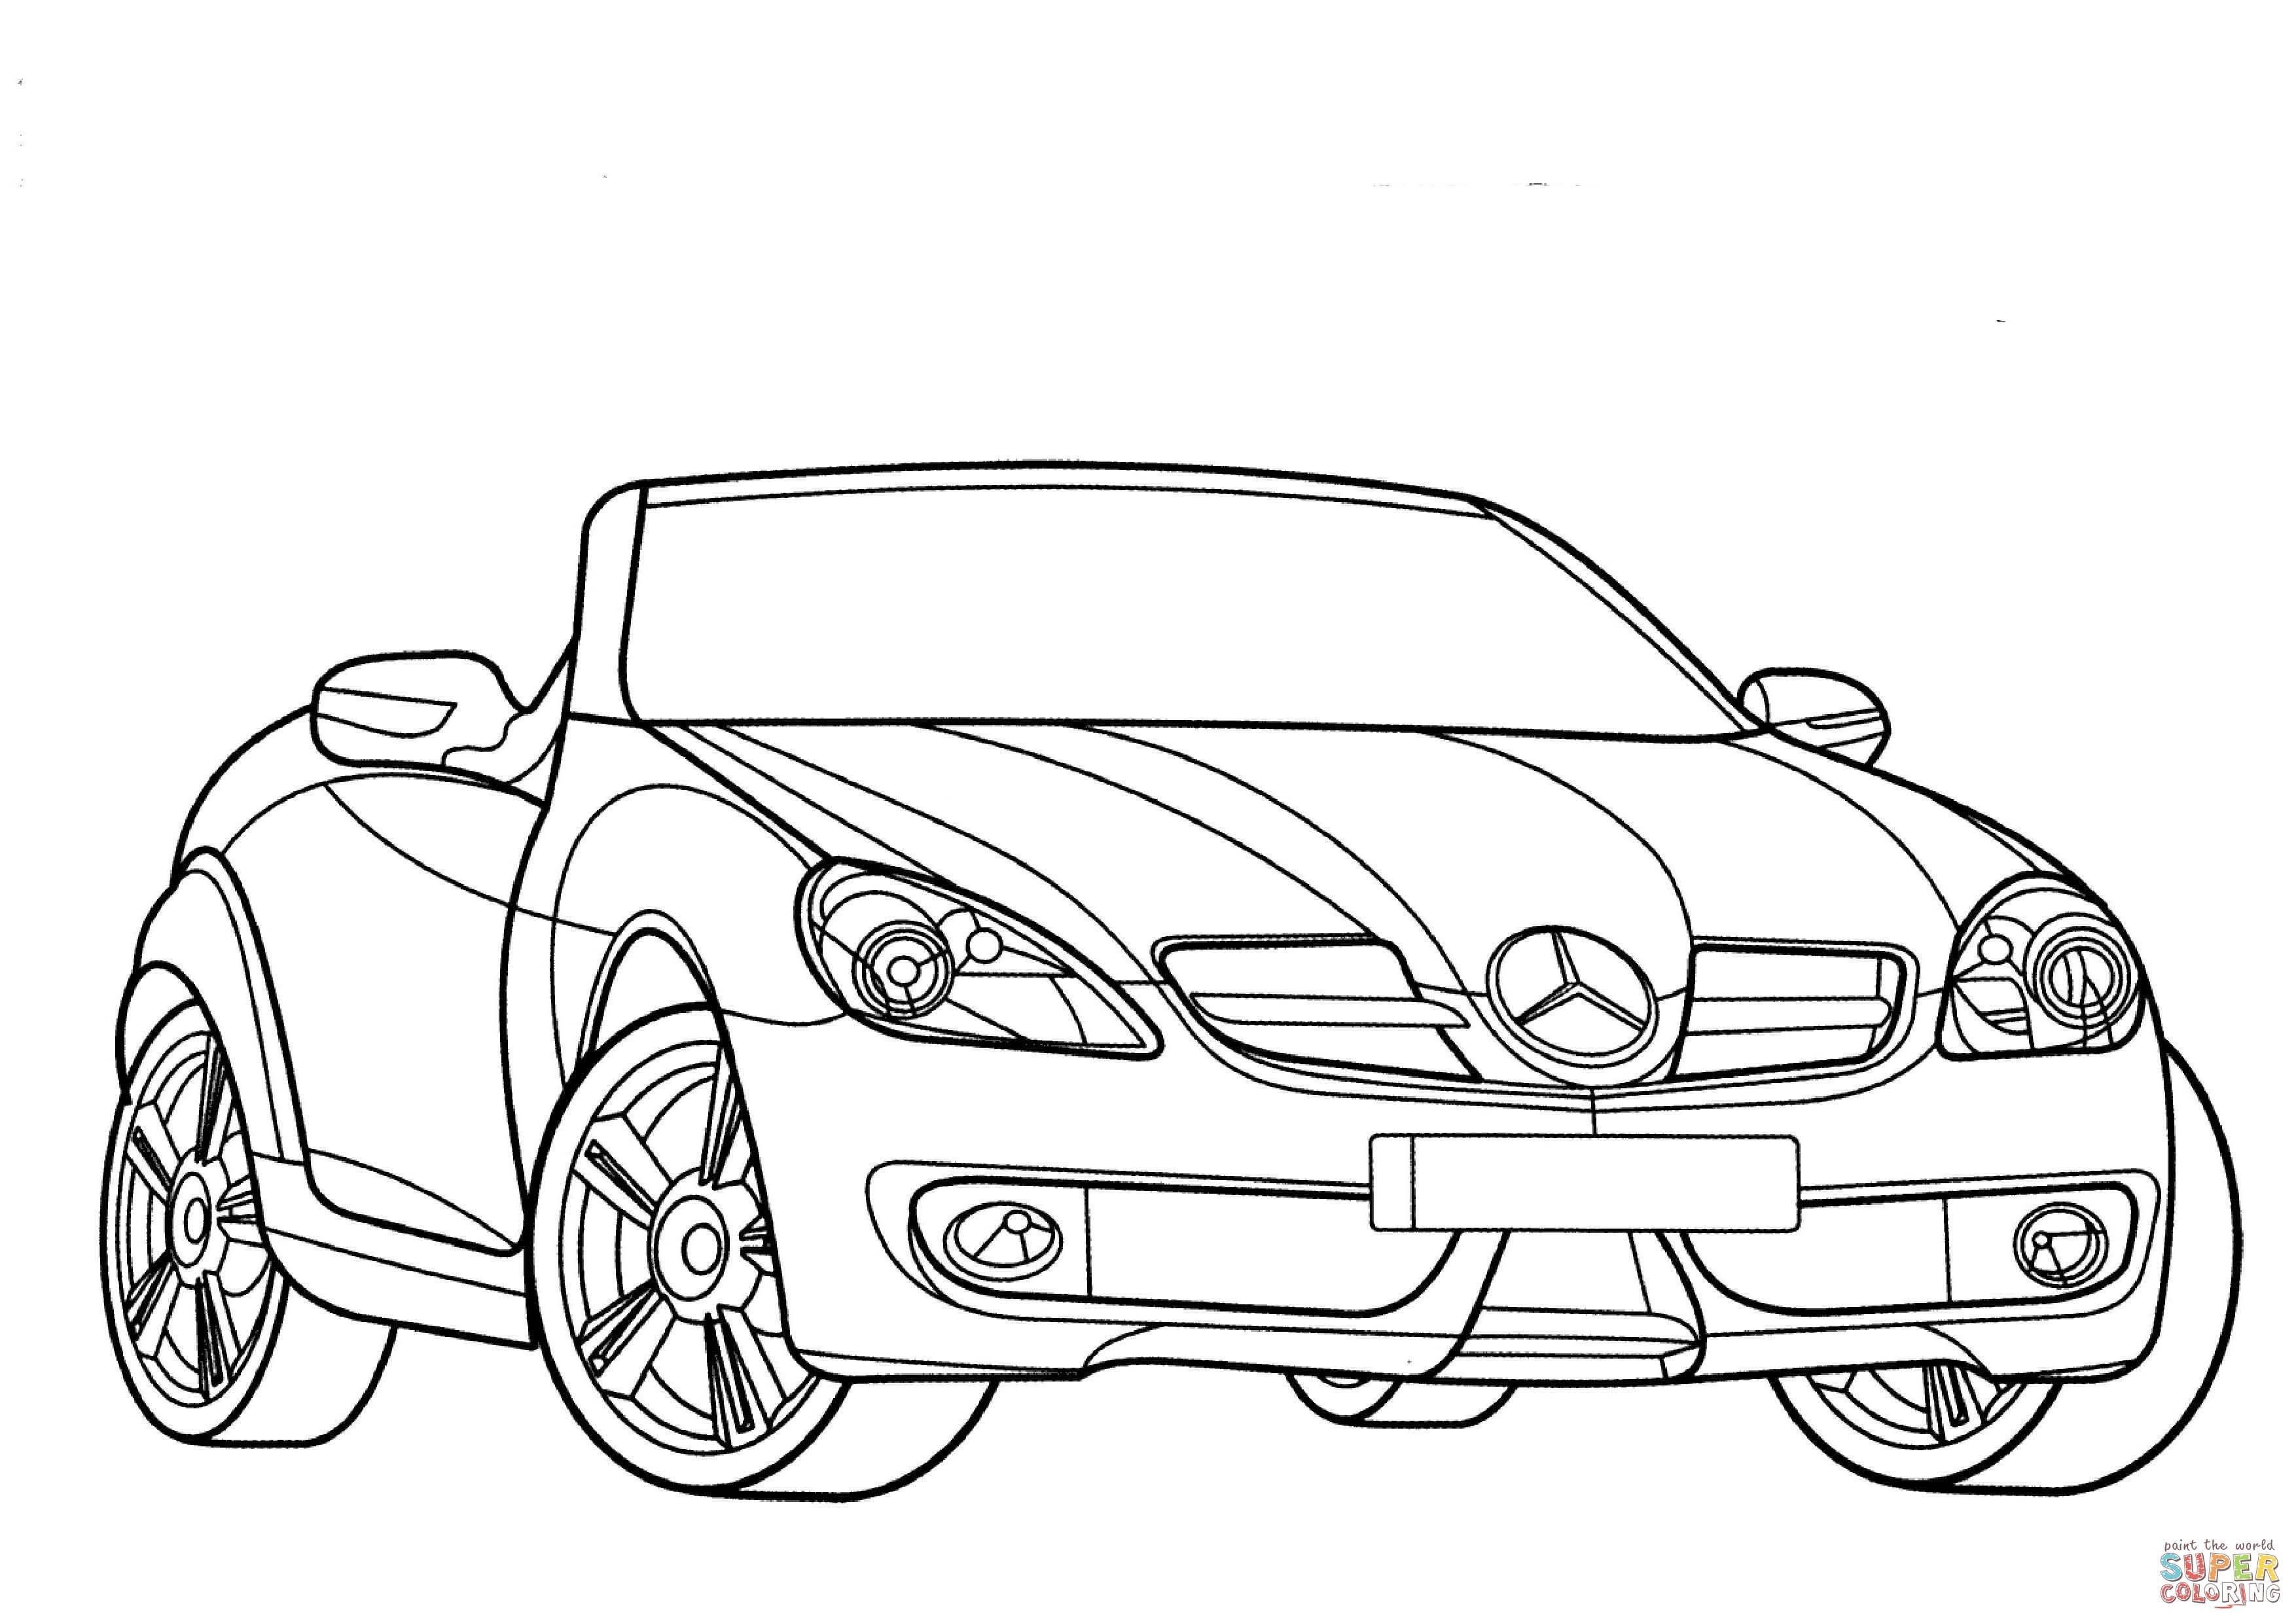 Disegno Di Mercedes Benz Classe Slk Da Colorare